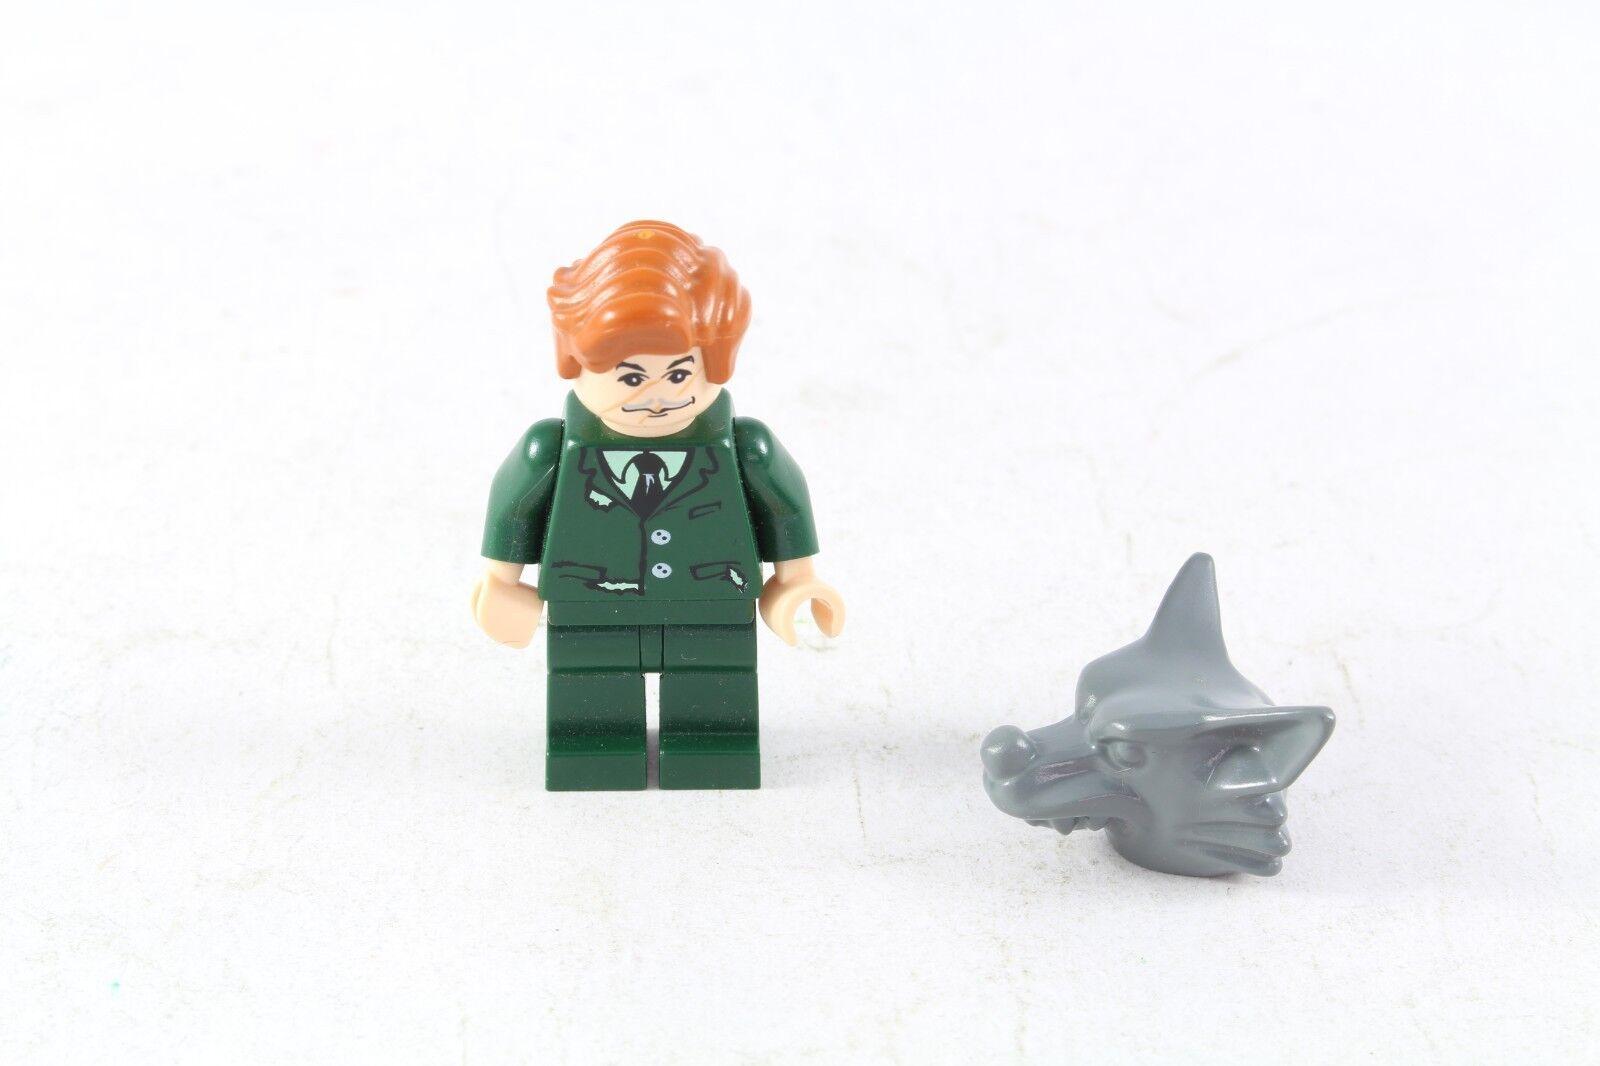 Lego Harry Potter Professor Remus Remus Remus Lupin 4758 Minifigure Genuine Very Good a78462